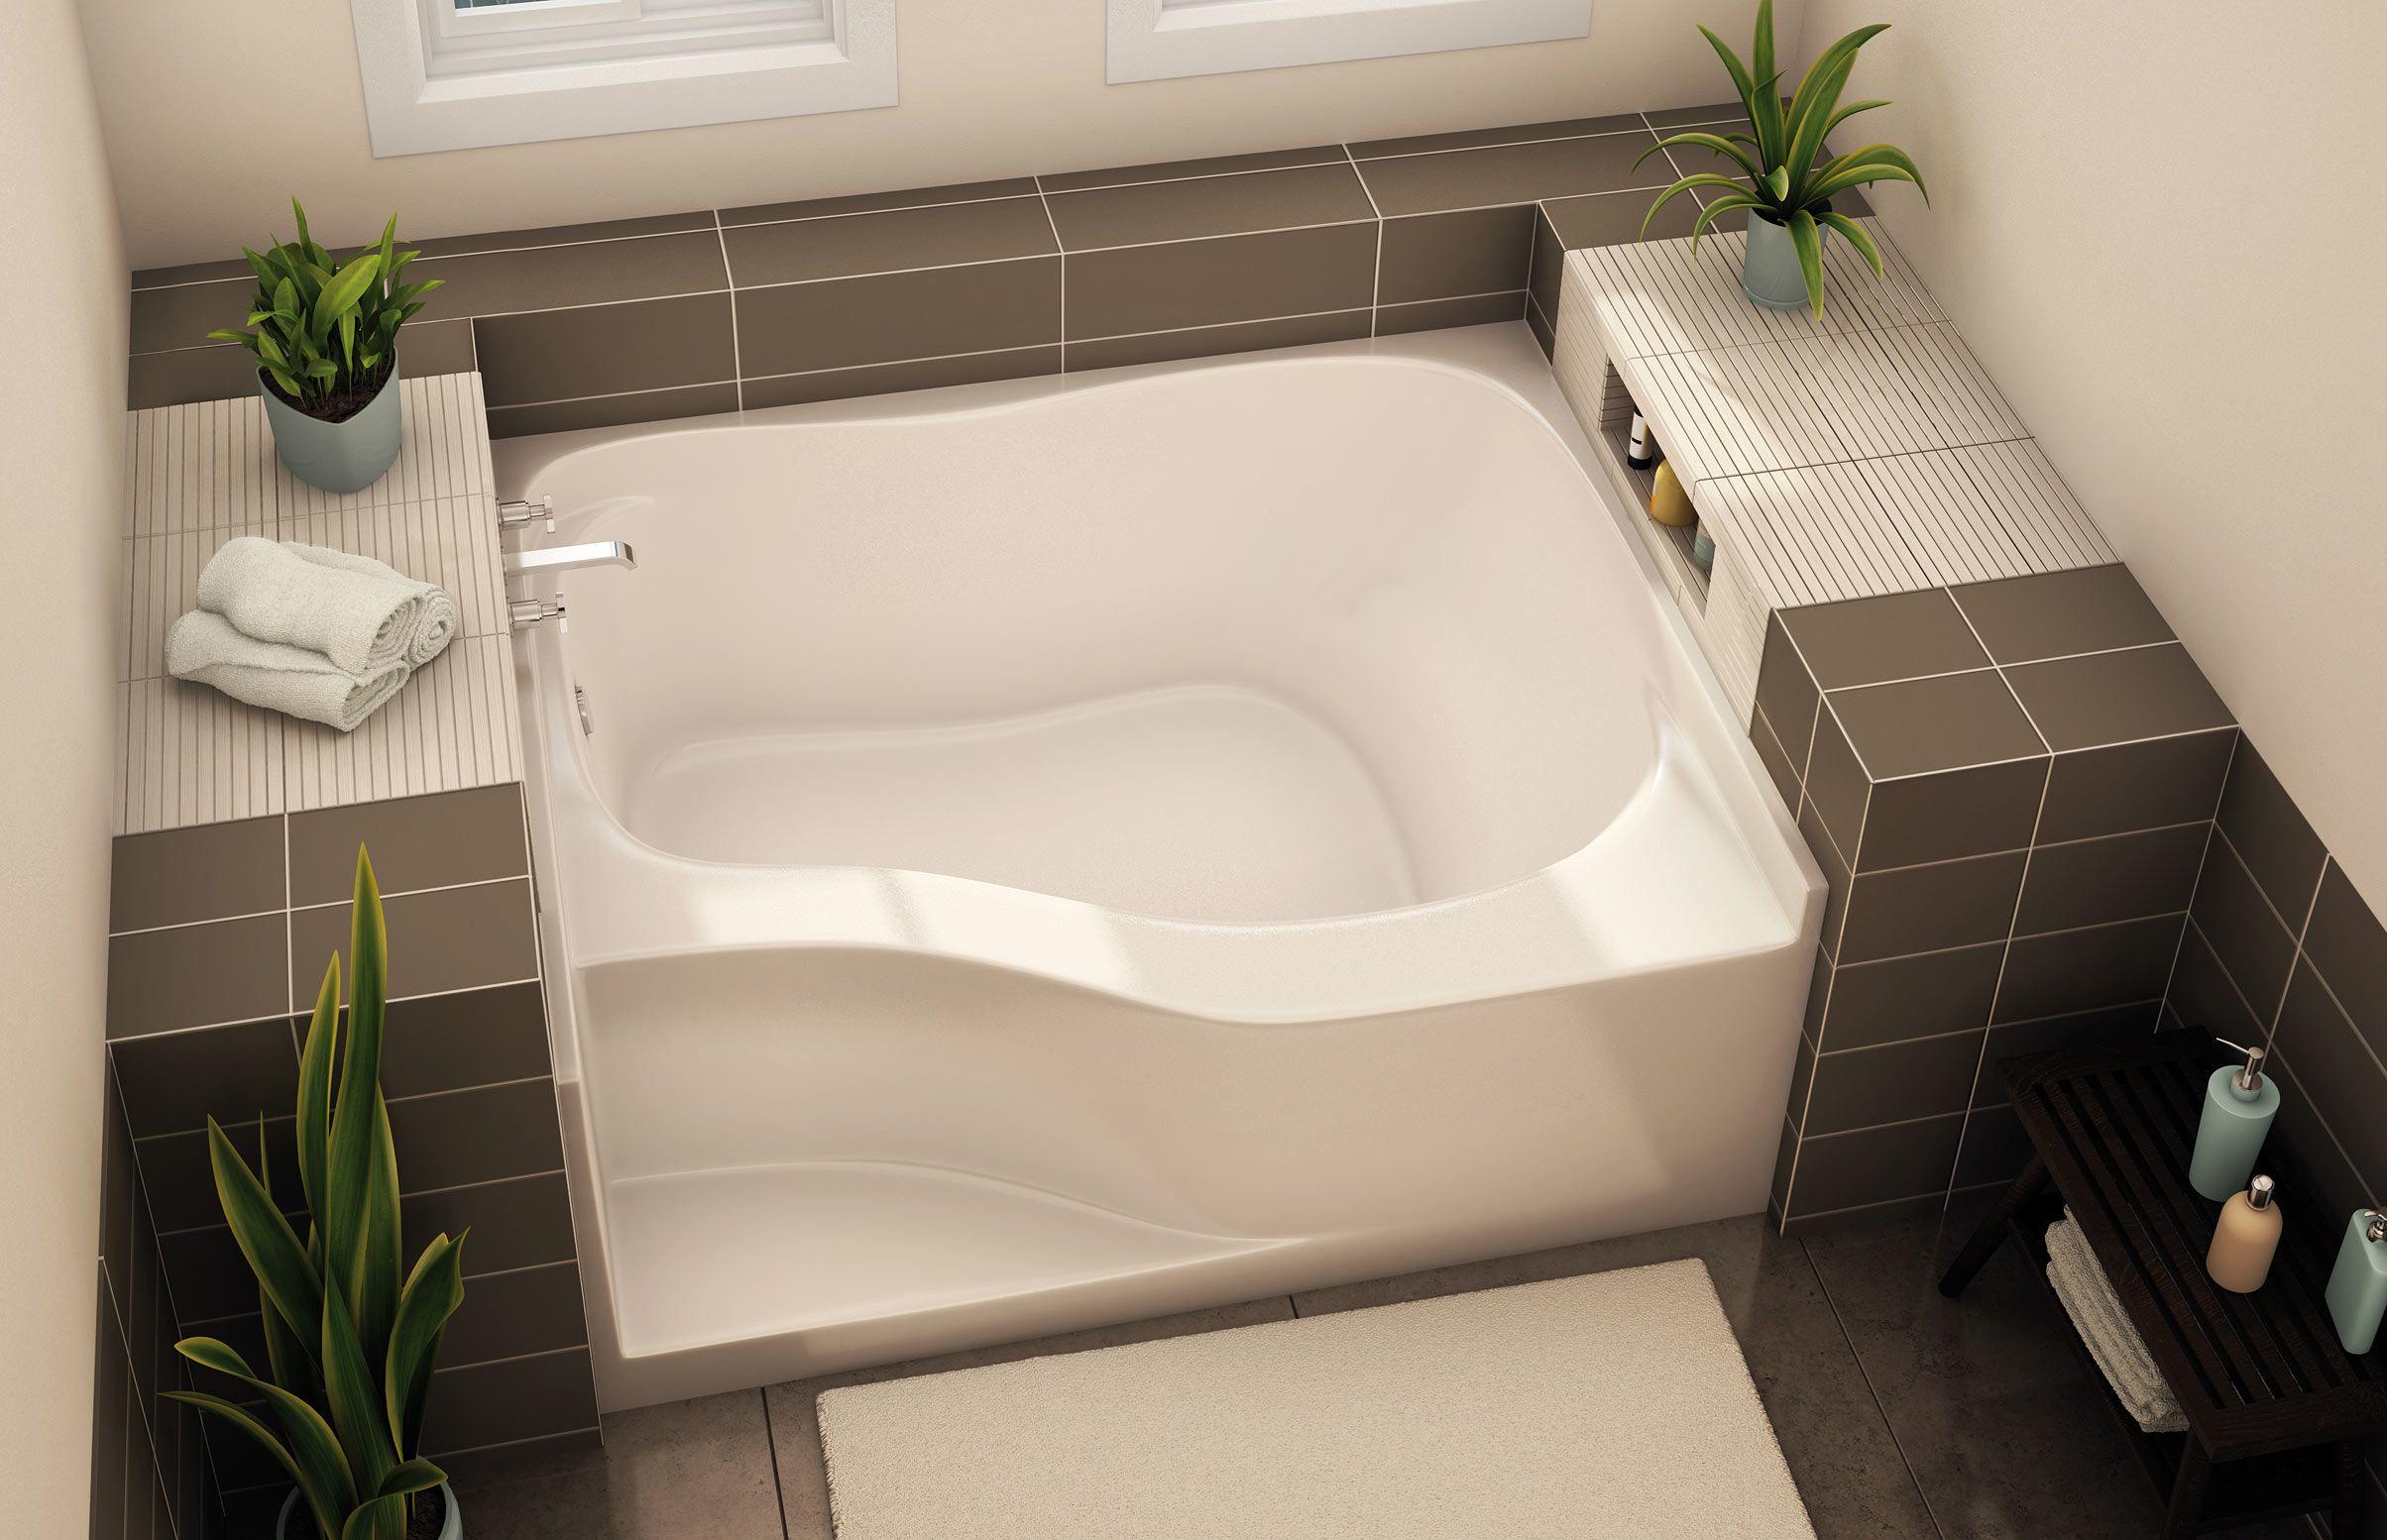 low bathtub - Google претрага | Teta Vidicin stan | Pinterest ...